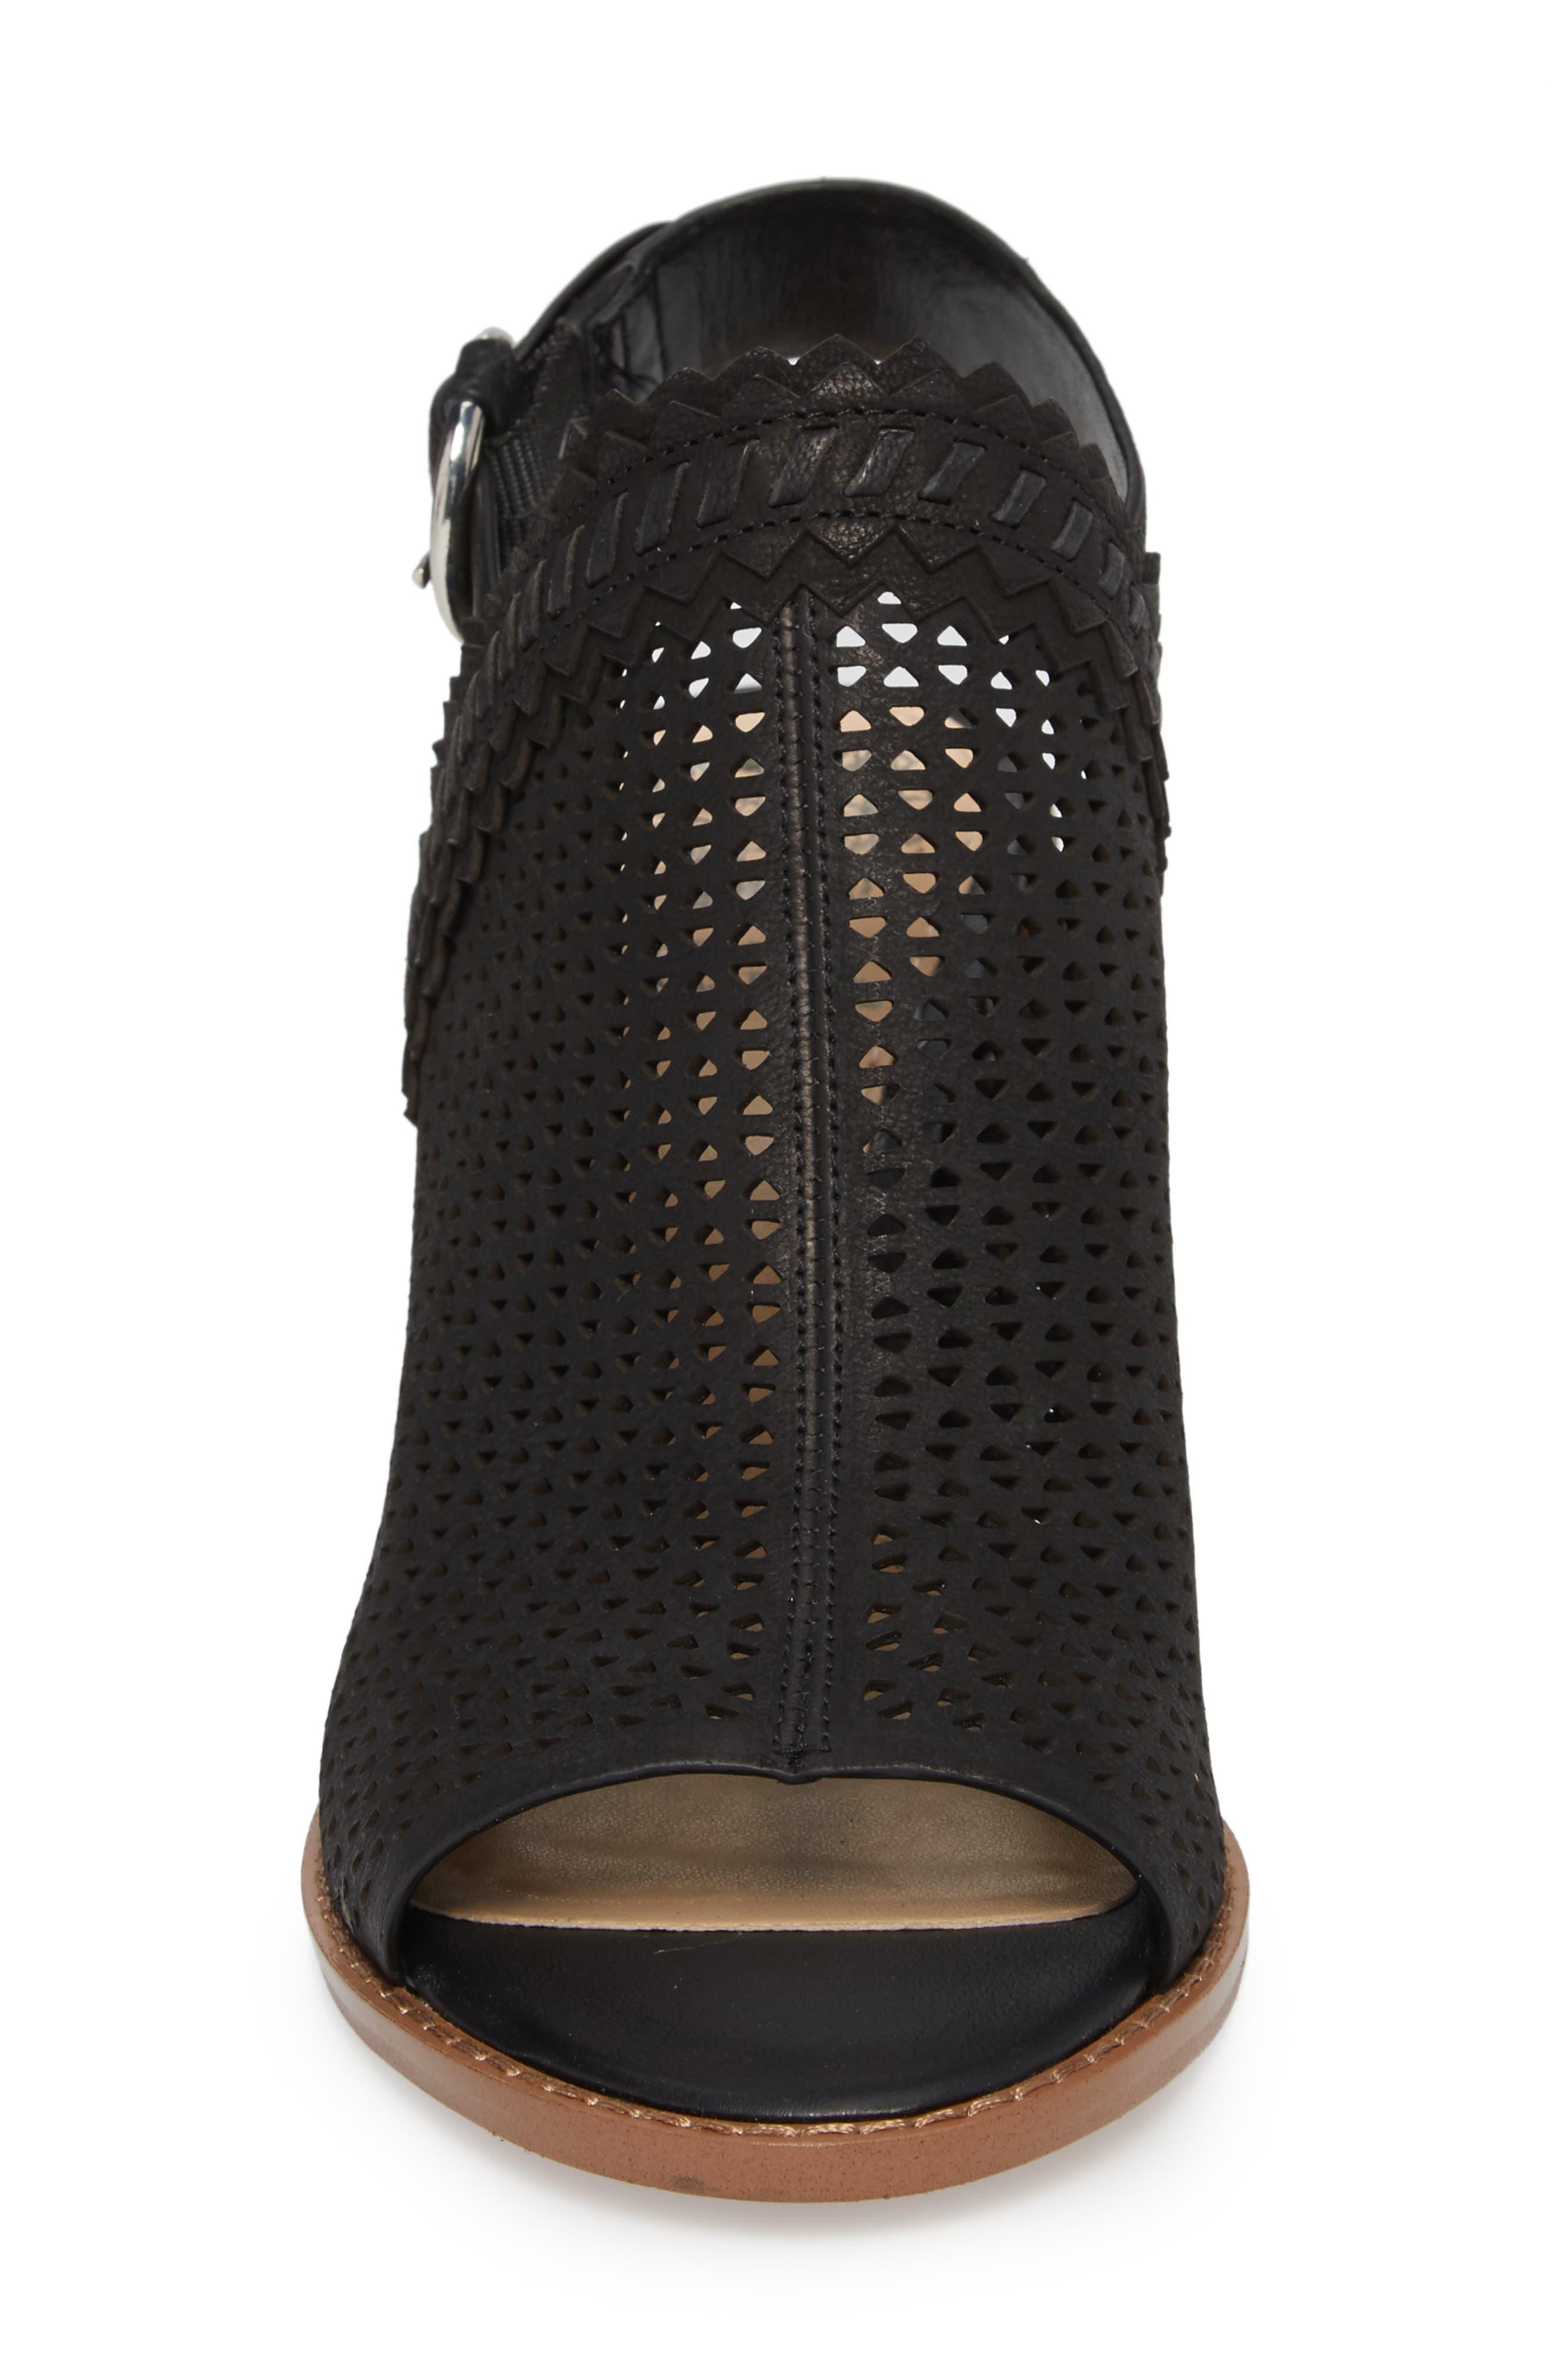 Tricinda Block Heel Sandal,                             Alternate thumbnail 4, color,                             BLACK LEATHER